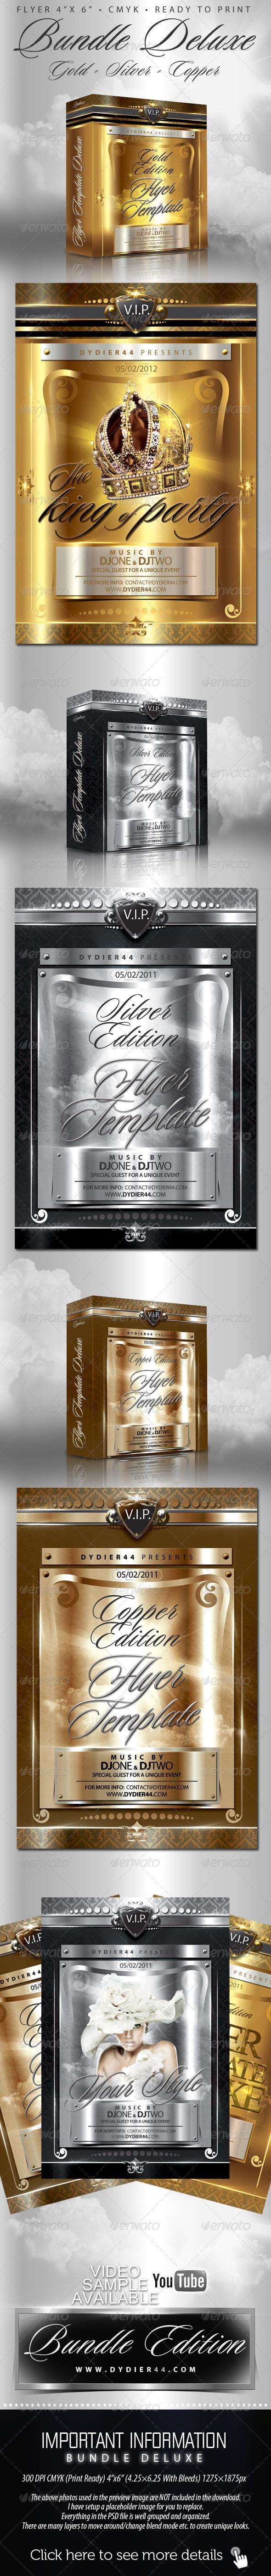 Bundle Deluxe (Flyer Template 4x6)  - Clubs & Parties Events